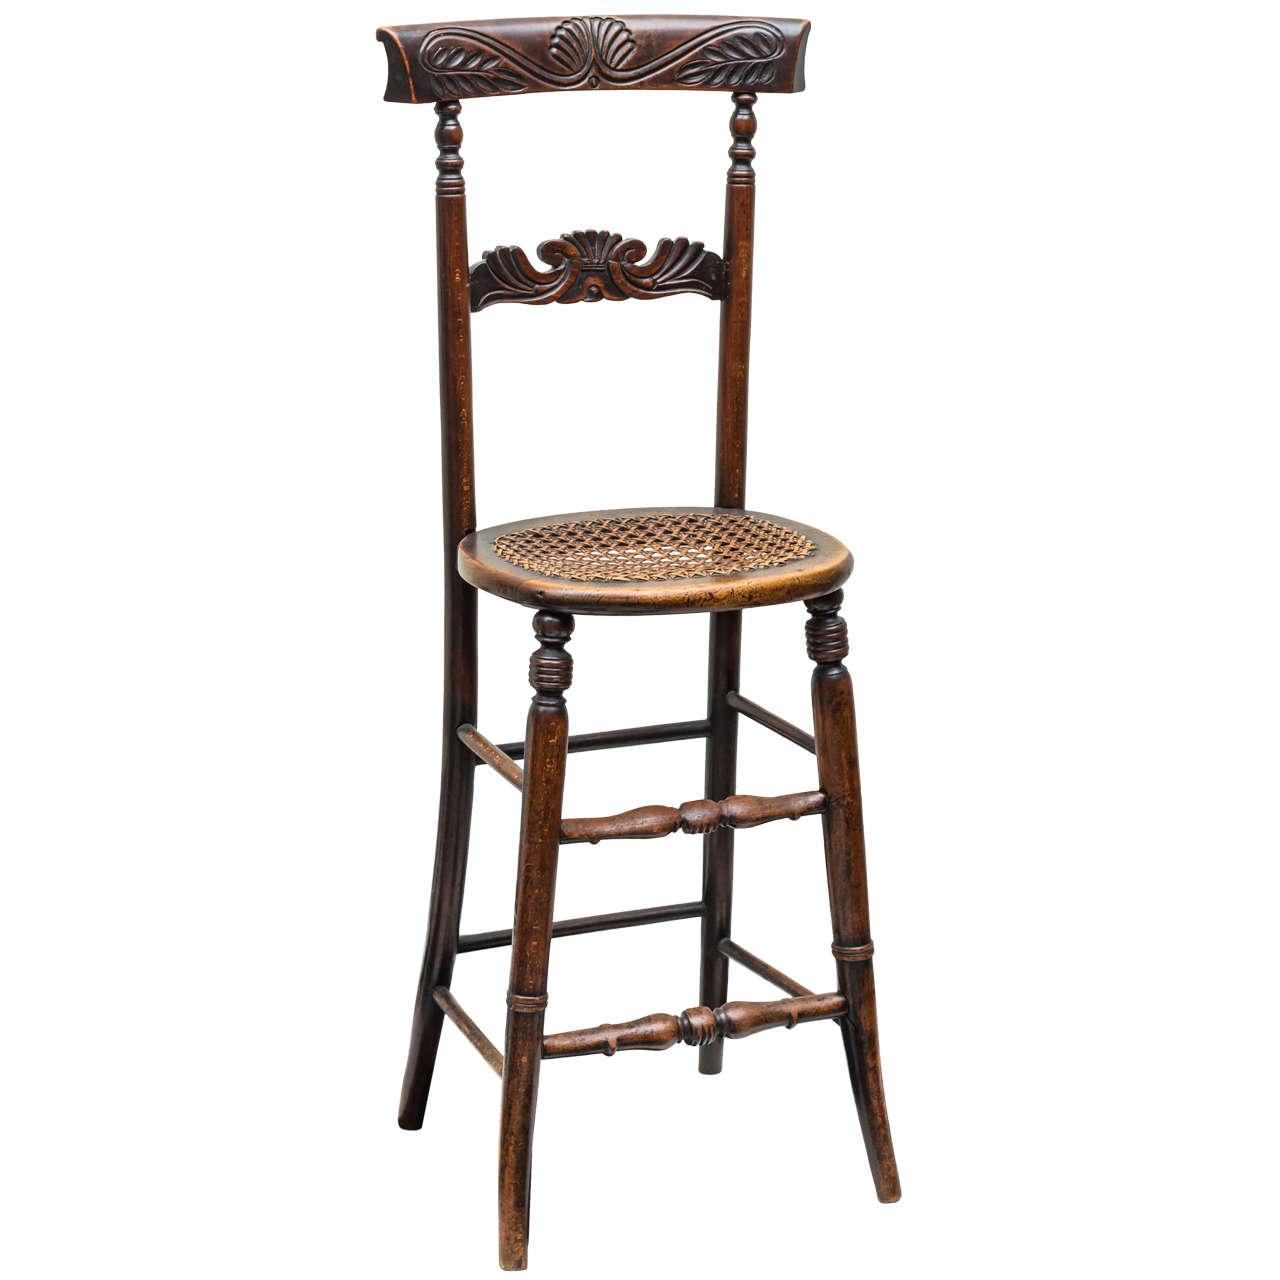 English William IV Mahogany Posture Discipline Chair Circa - Posture chair